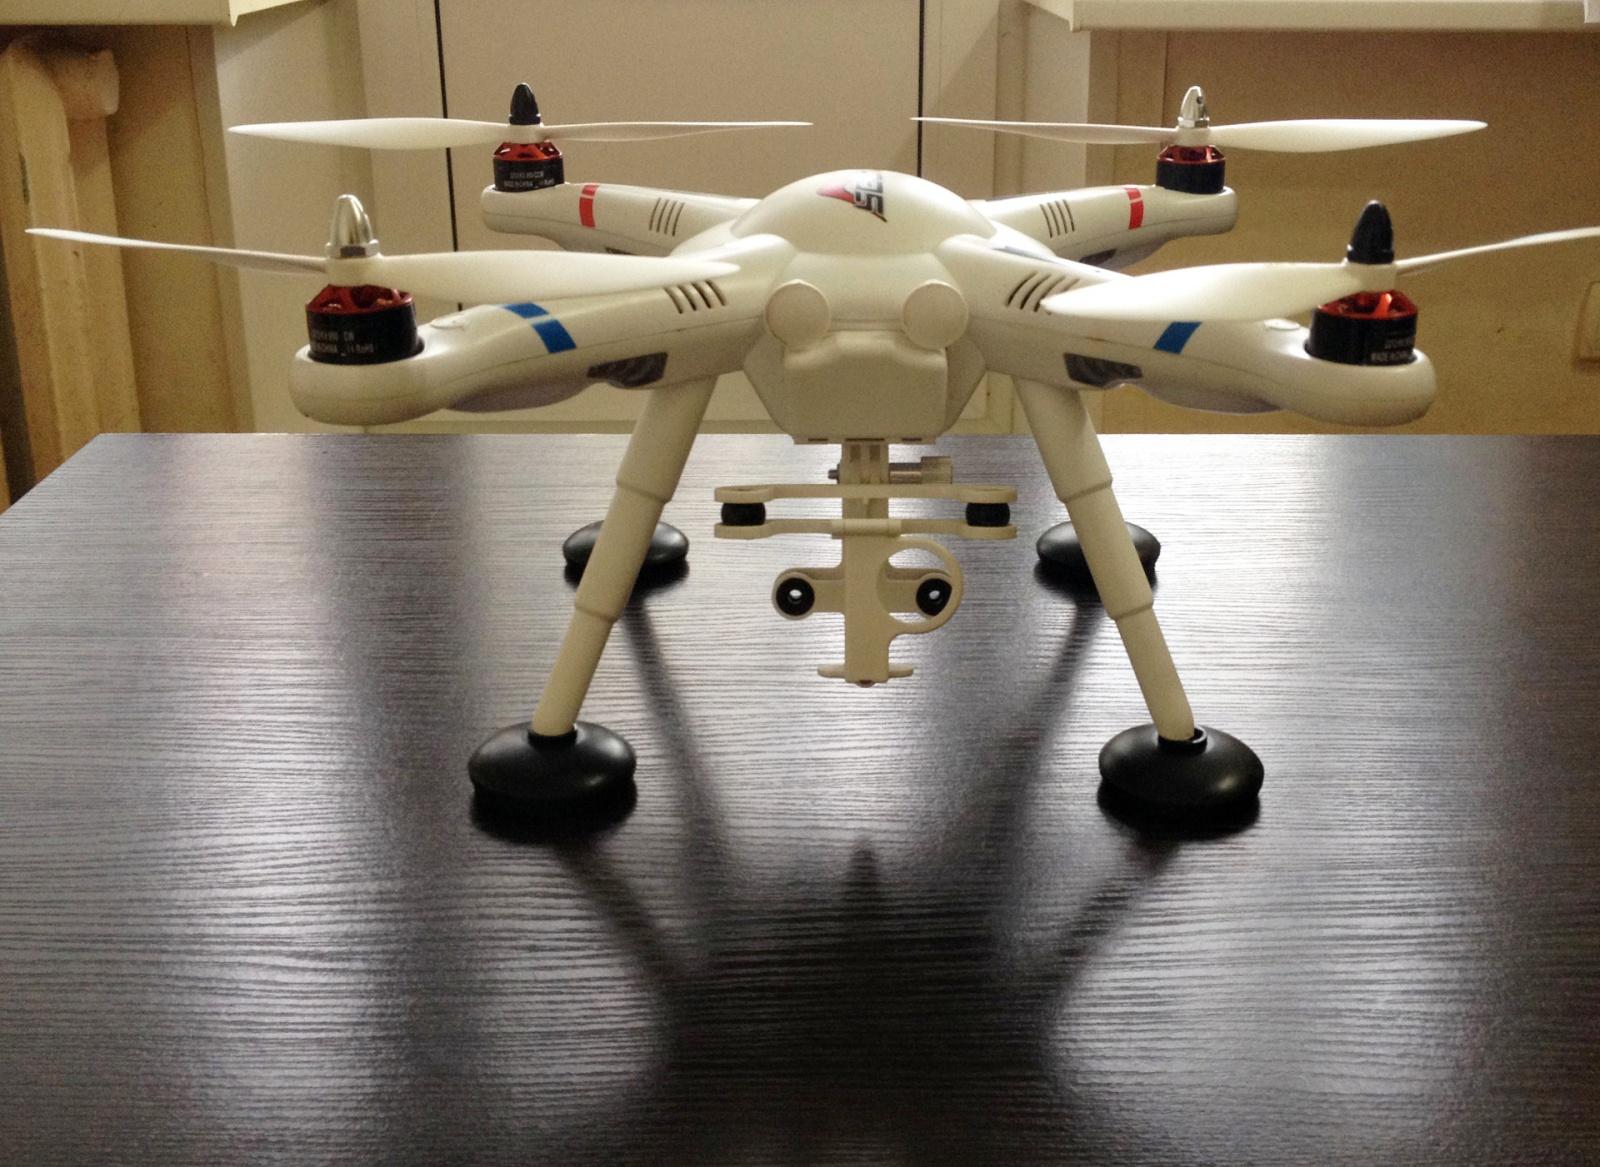 Квадрокоптер для GoPro глазами девушки — Wltoys v303 - 5